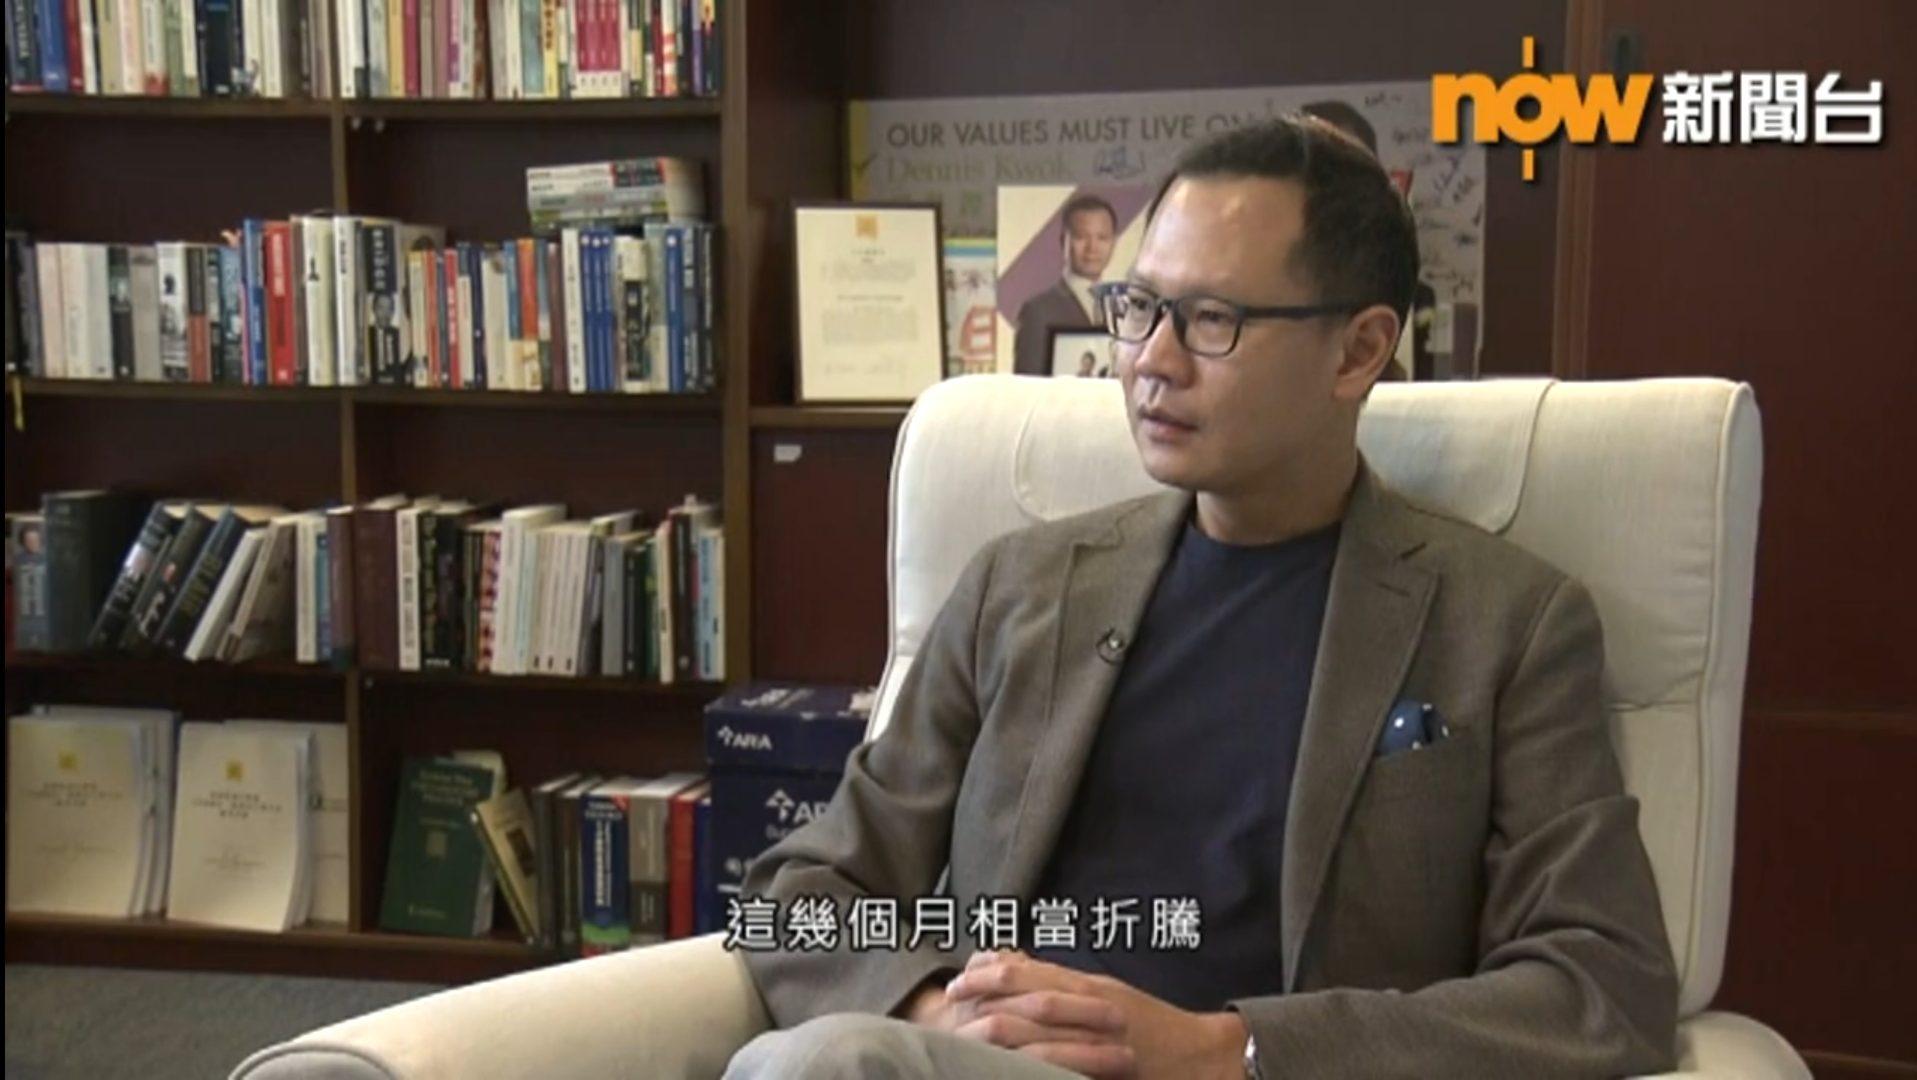 Dennis kwok announcing his departure from HK politics.